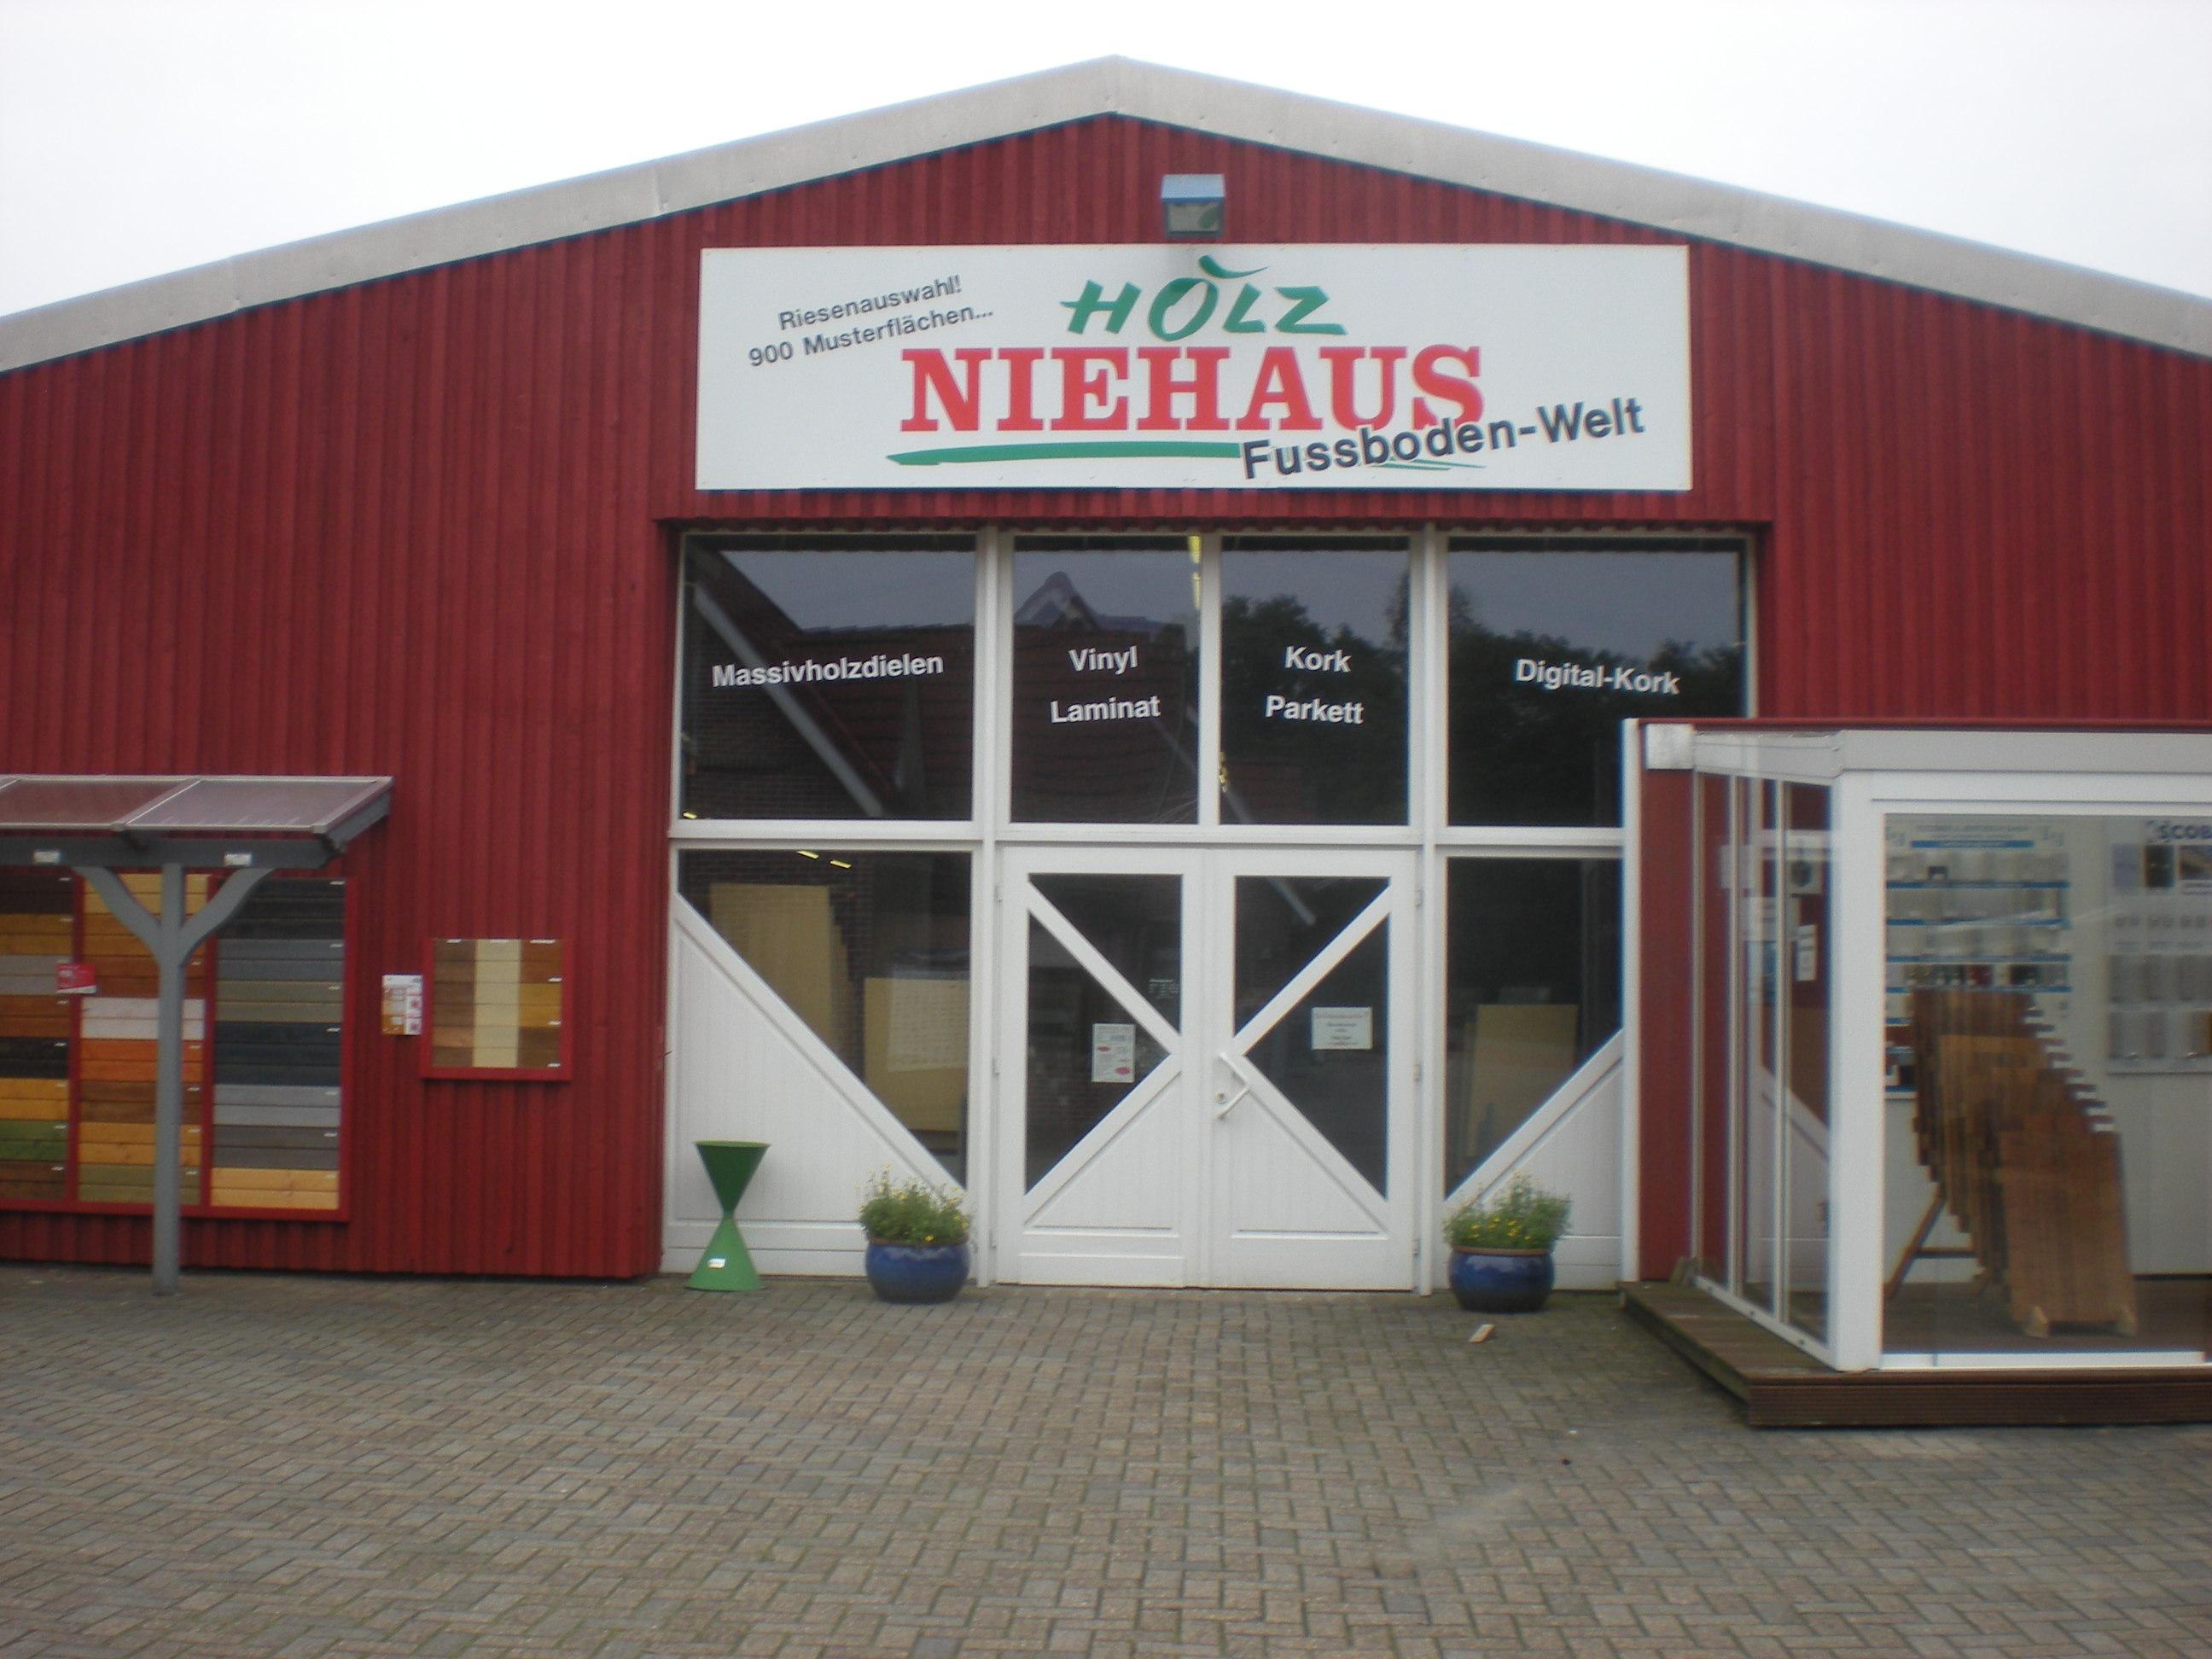 Fotos de Holz Niehaus Sedelsberg